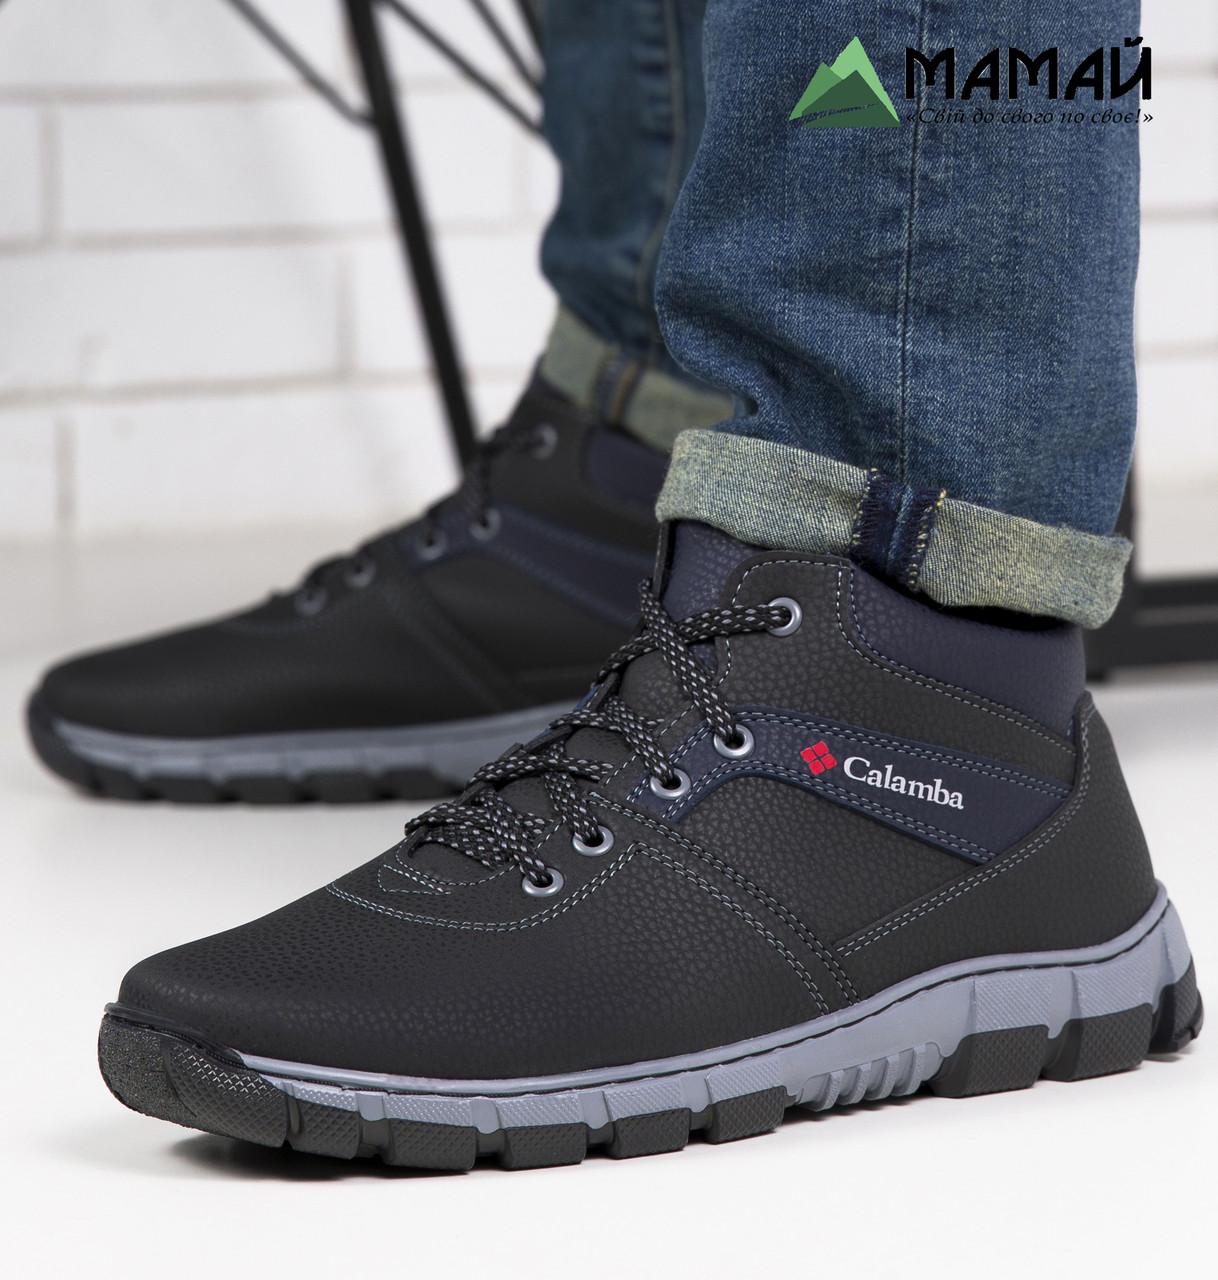 Ботинки мужские -20°C